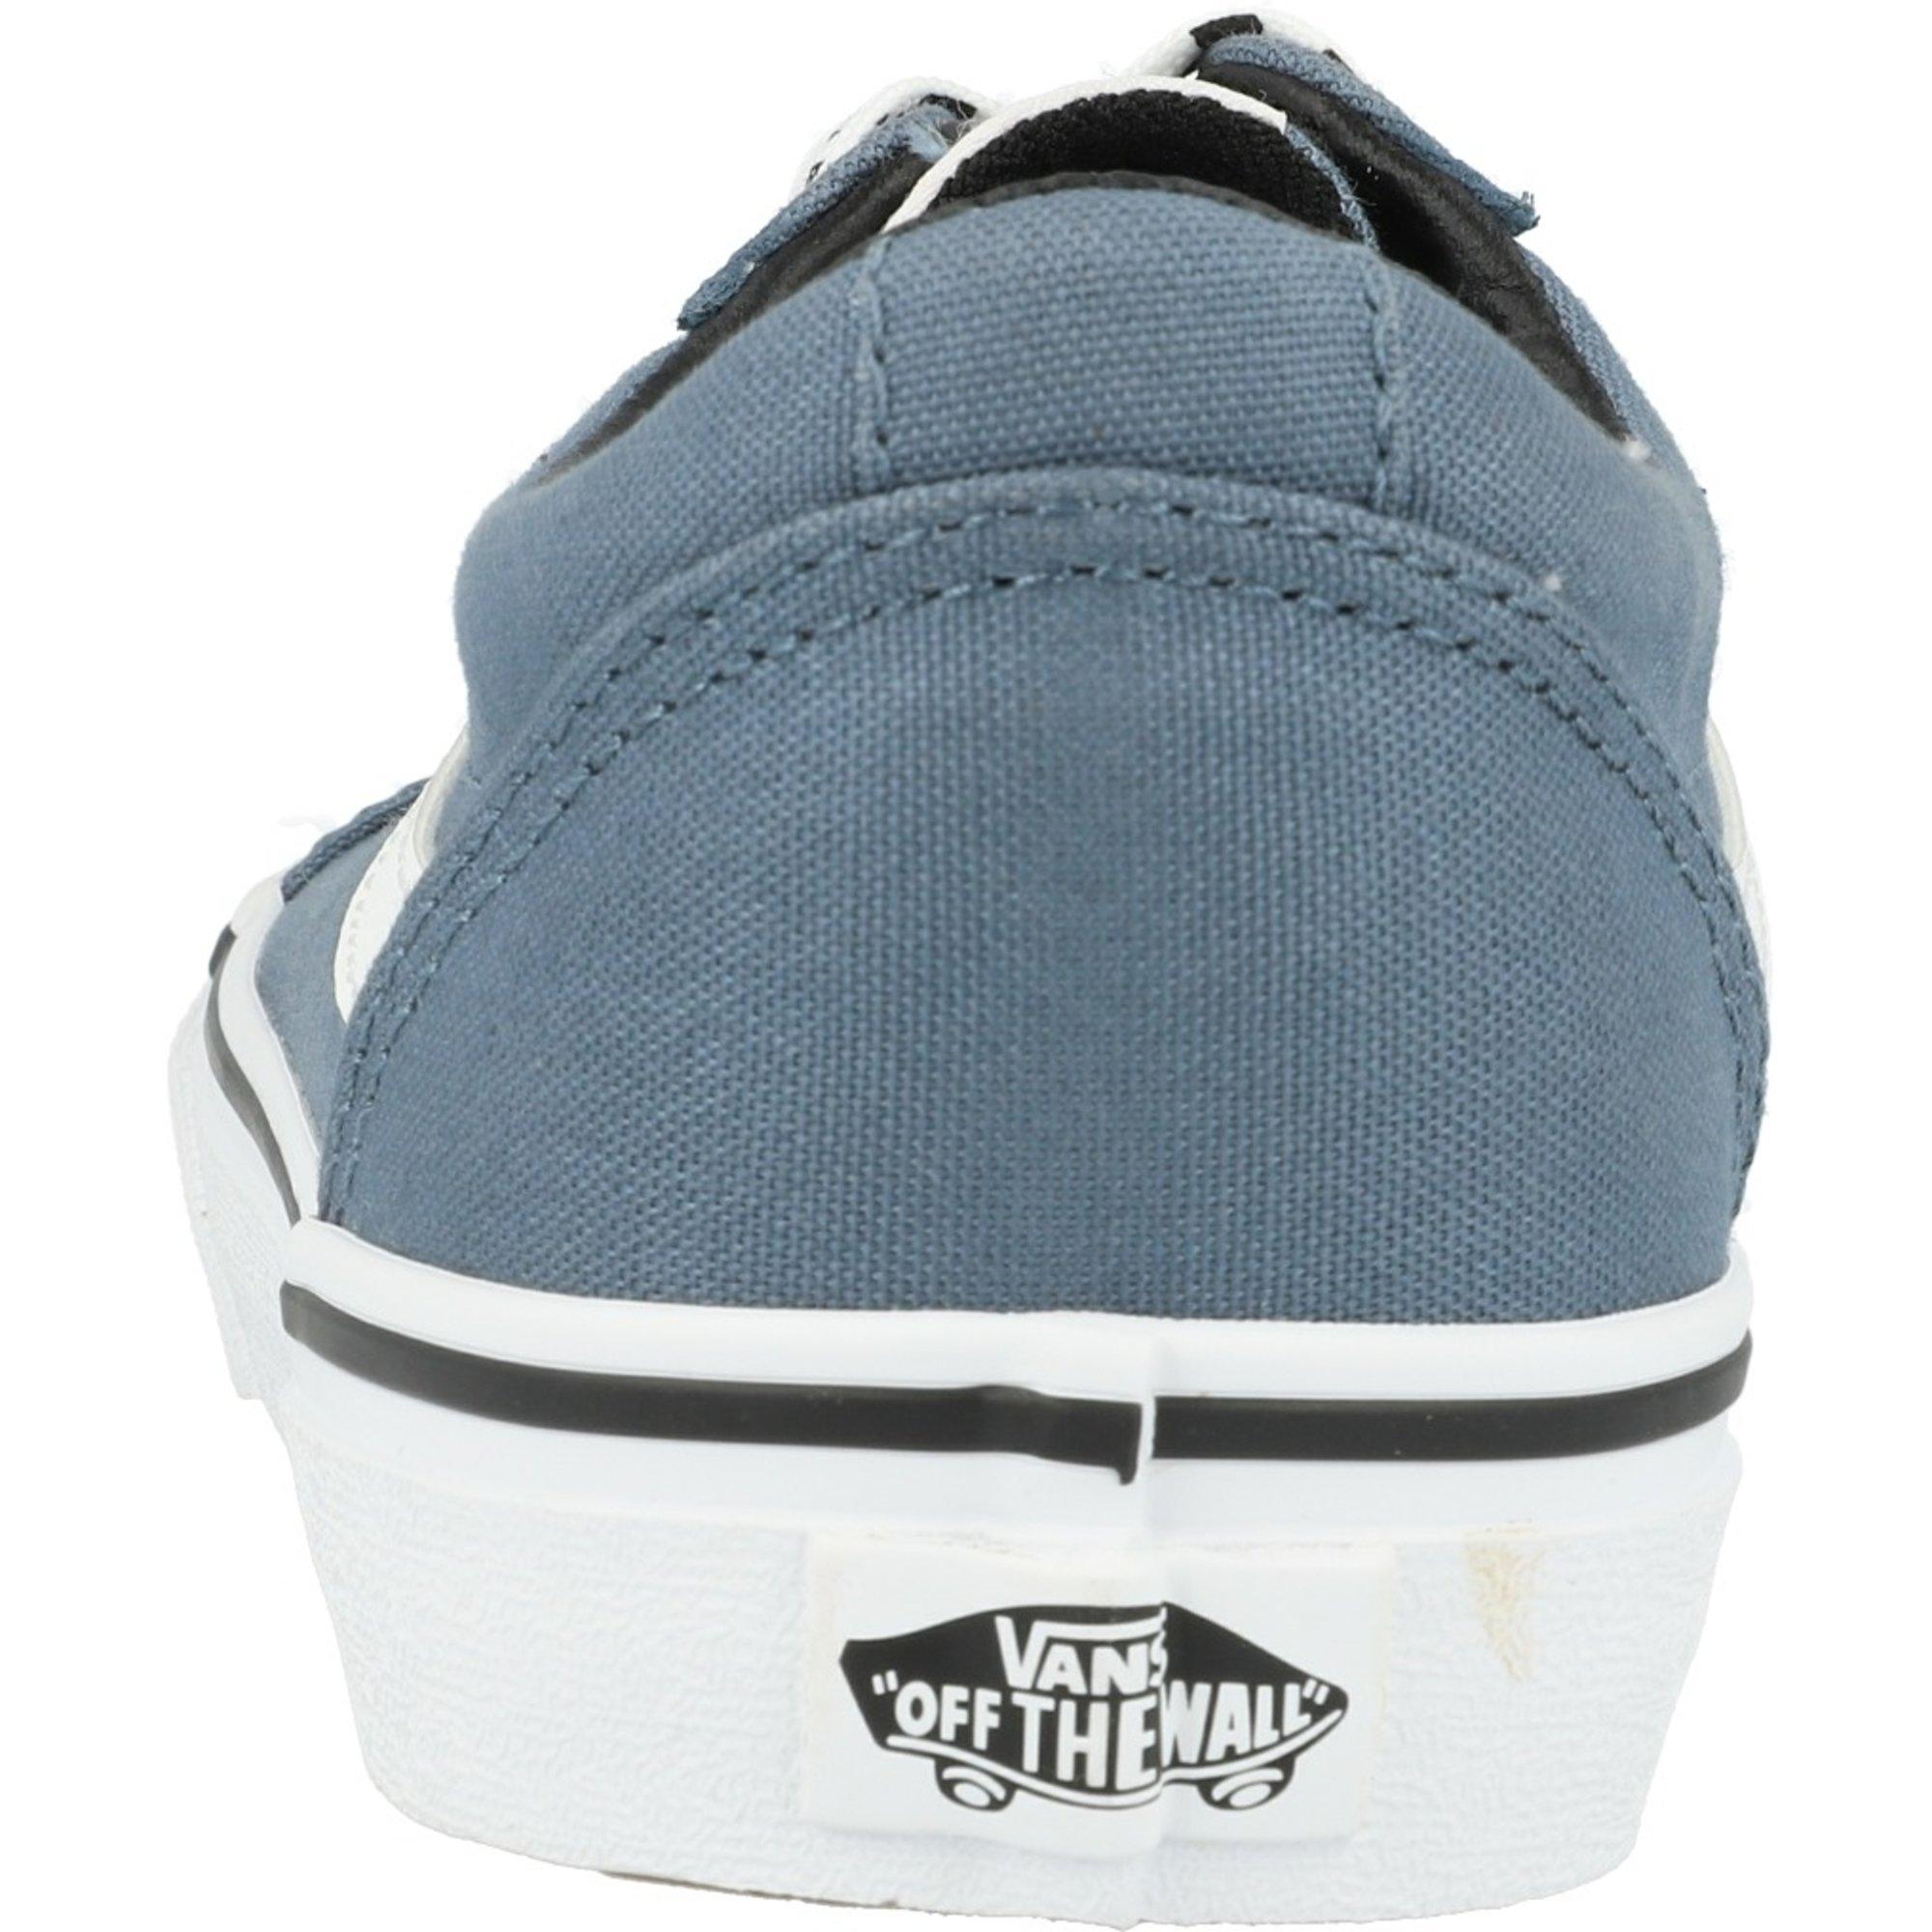 chaussures en toile enfant yt ward vans